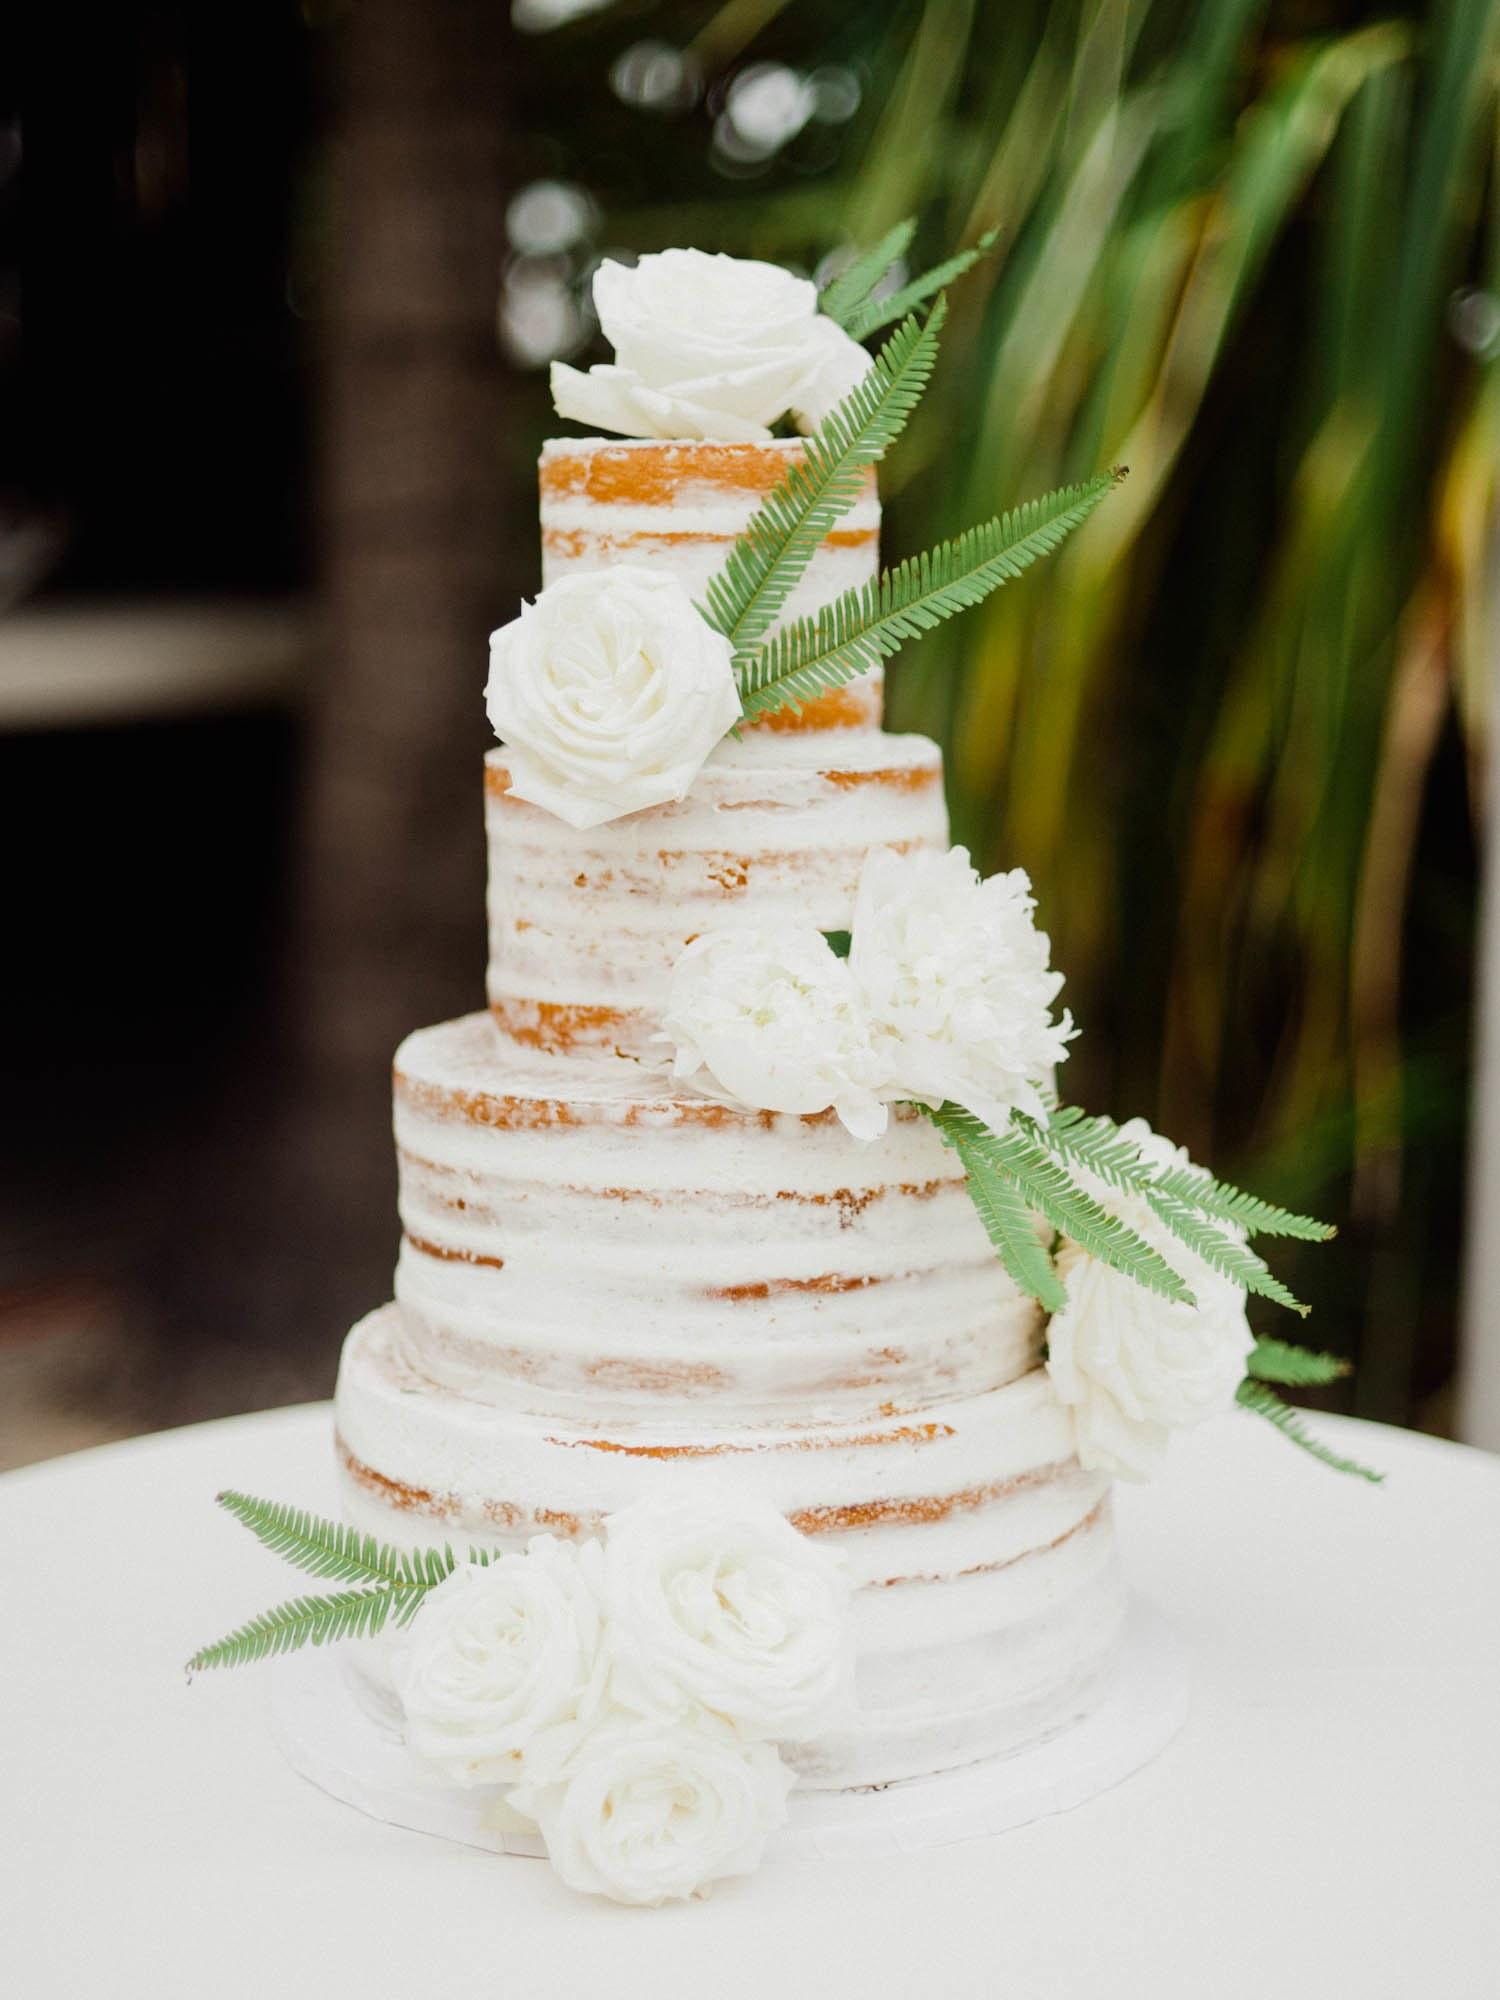 Free photo: Wedding cake - sweet, sugar, tasty - Non-Commercial ...